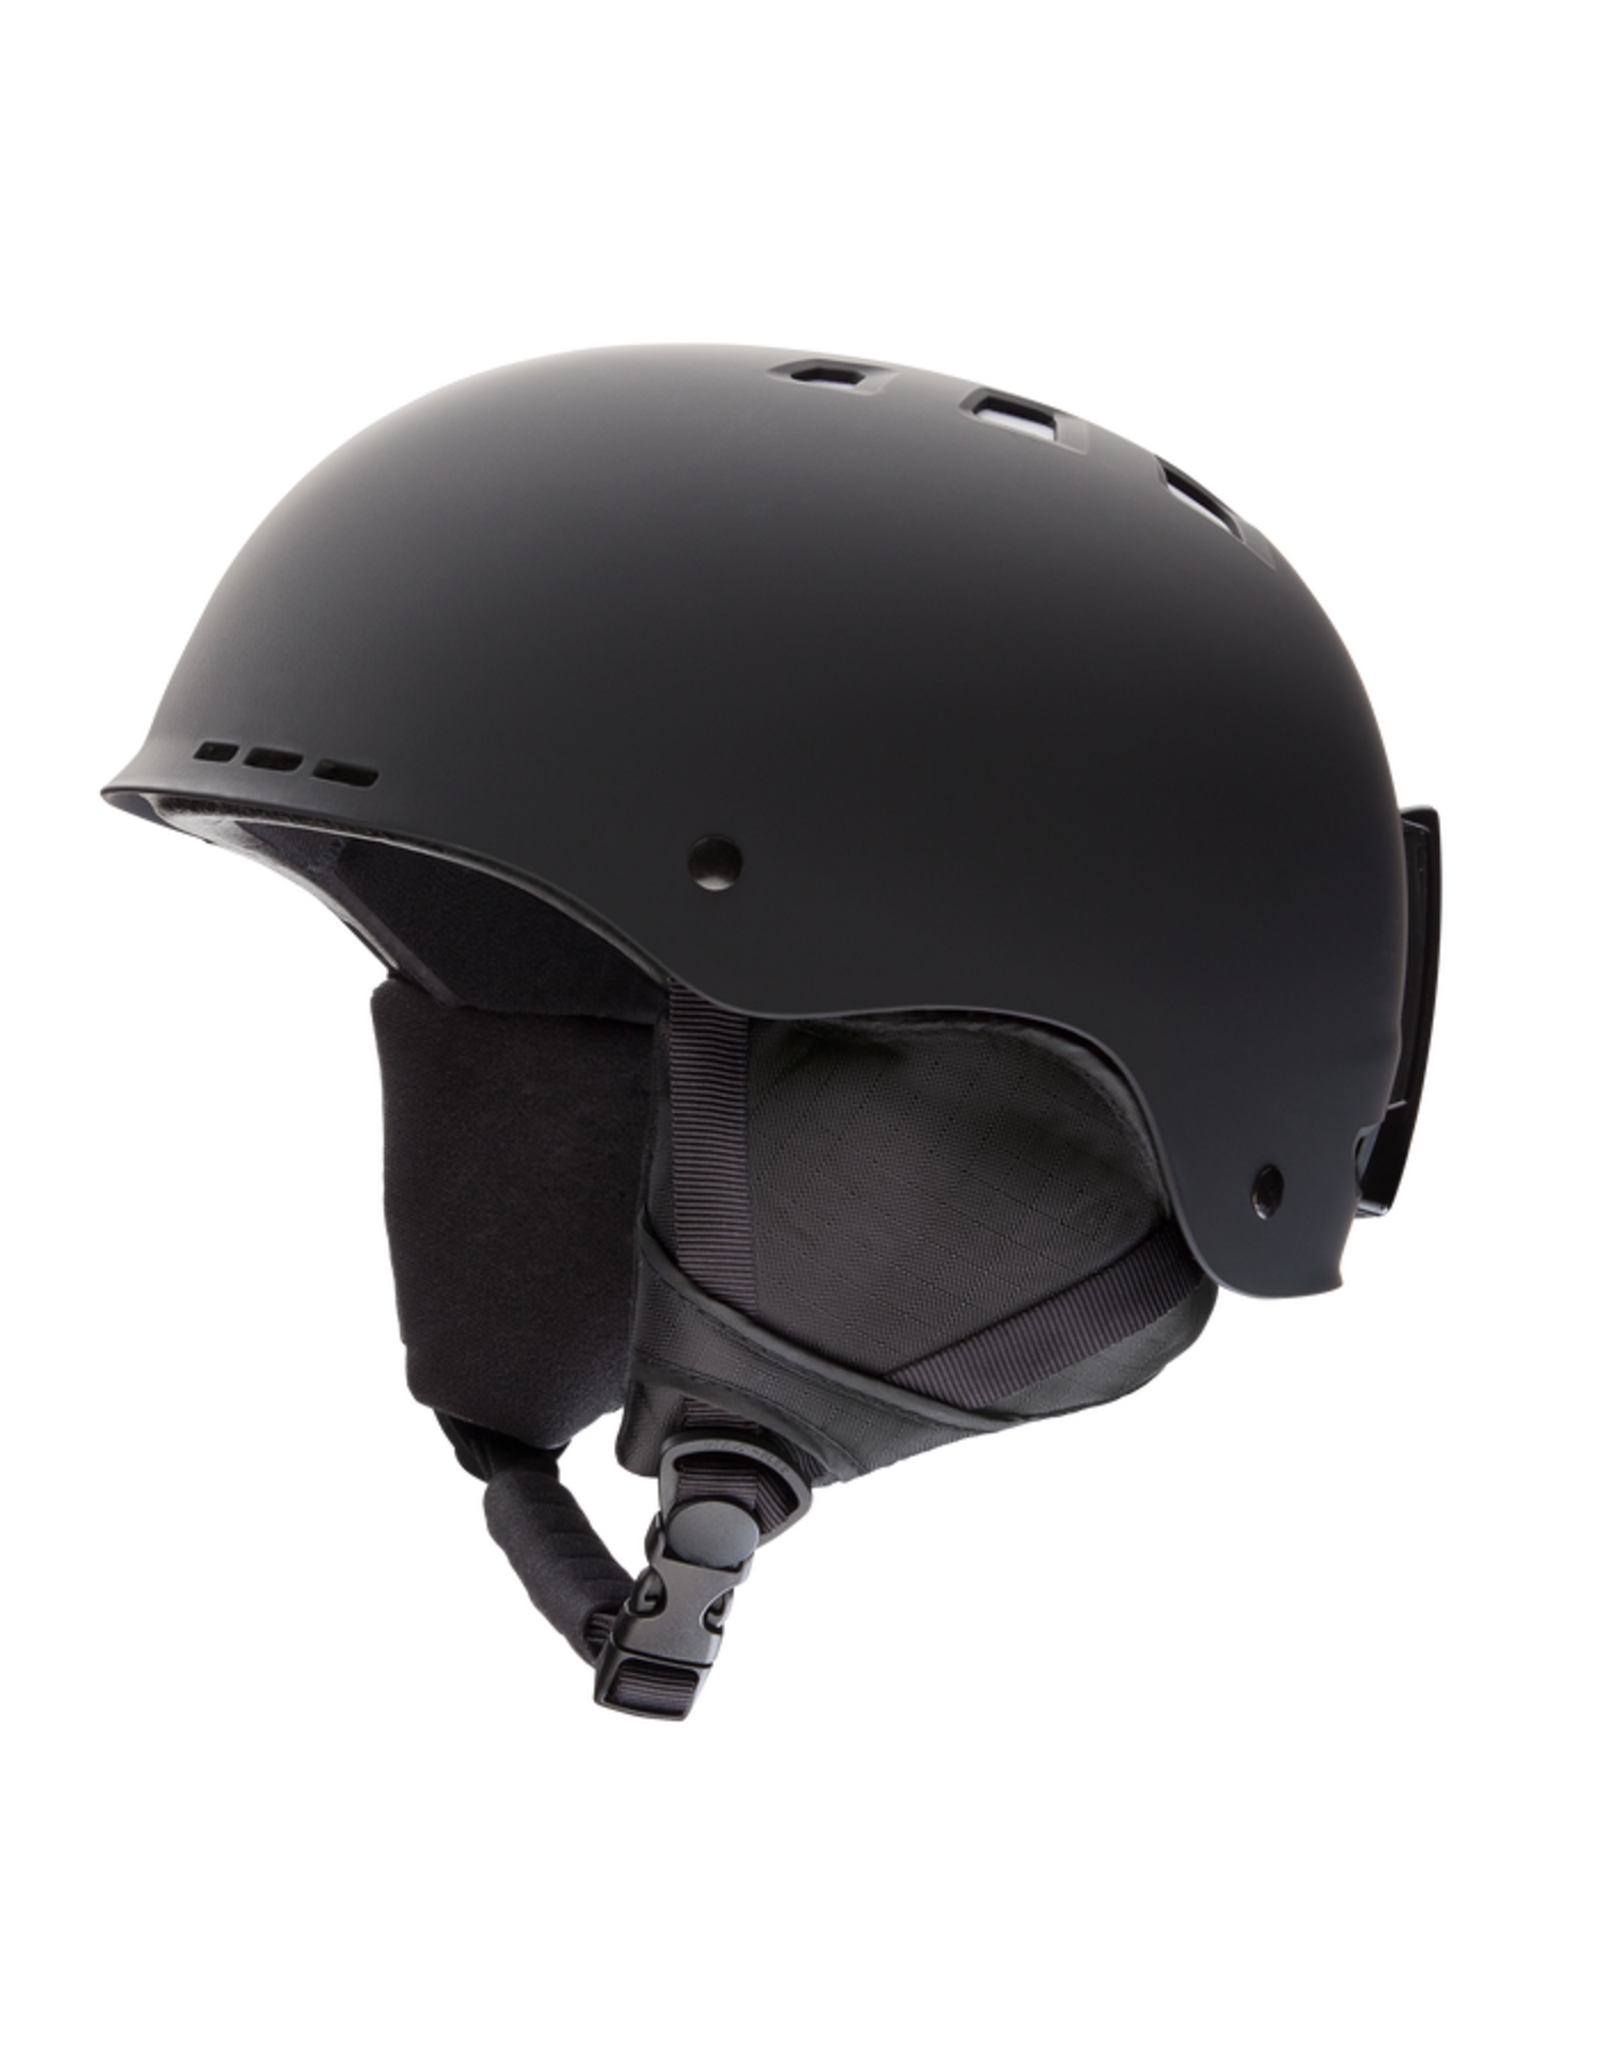 smith optics Smith Holt helmet - Matte Black - Medium 55-59cm